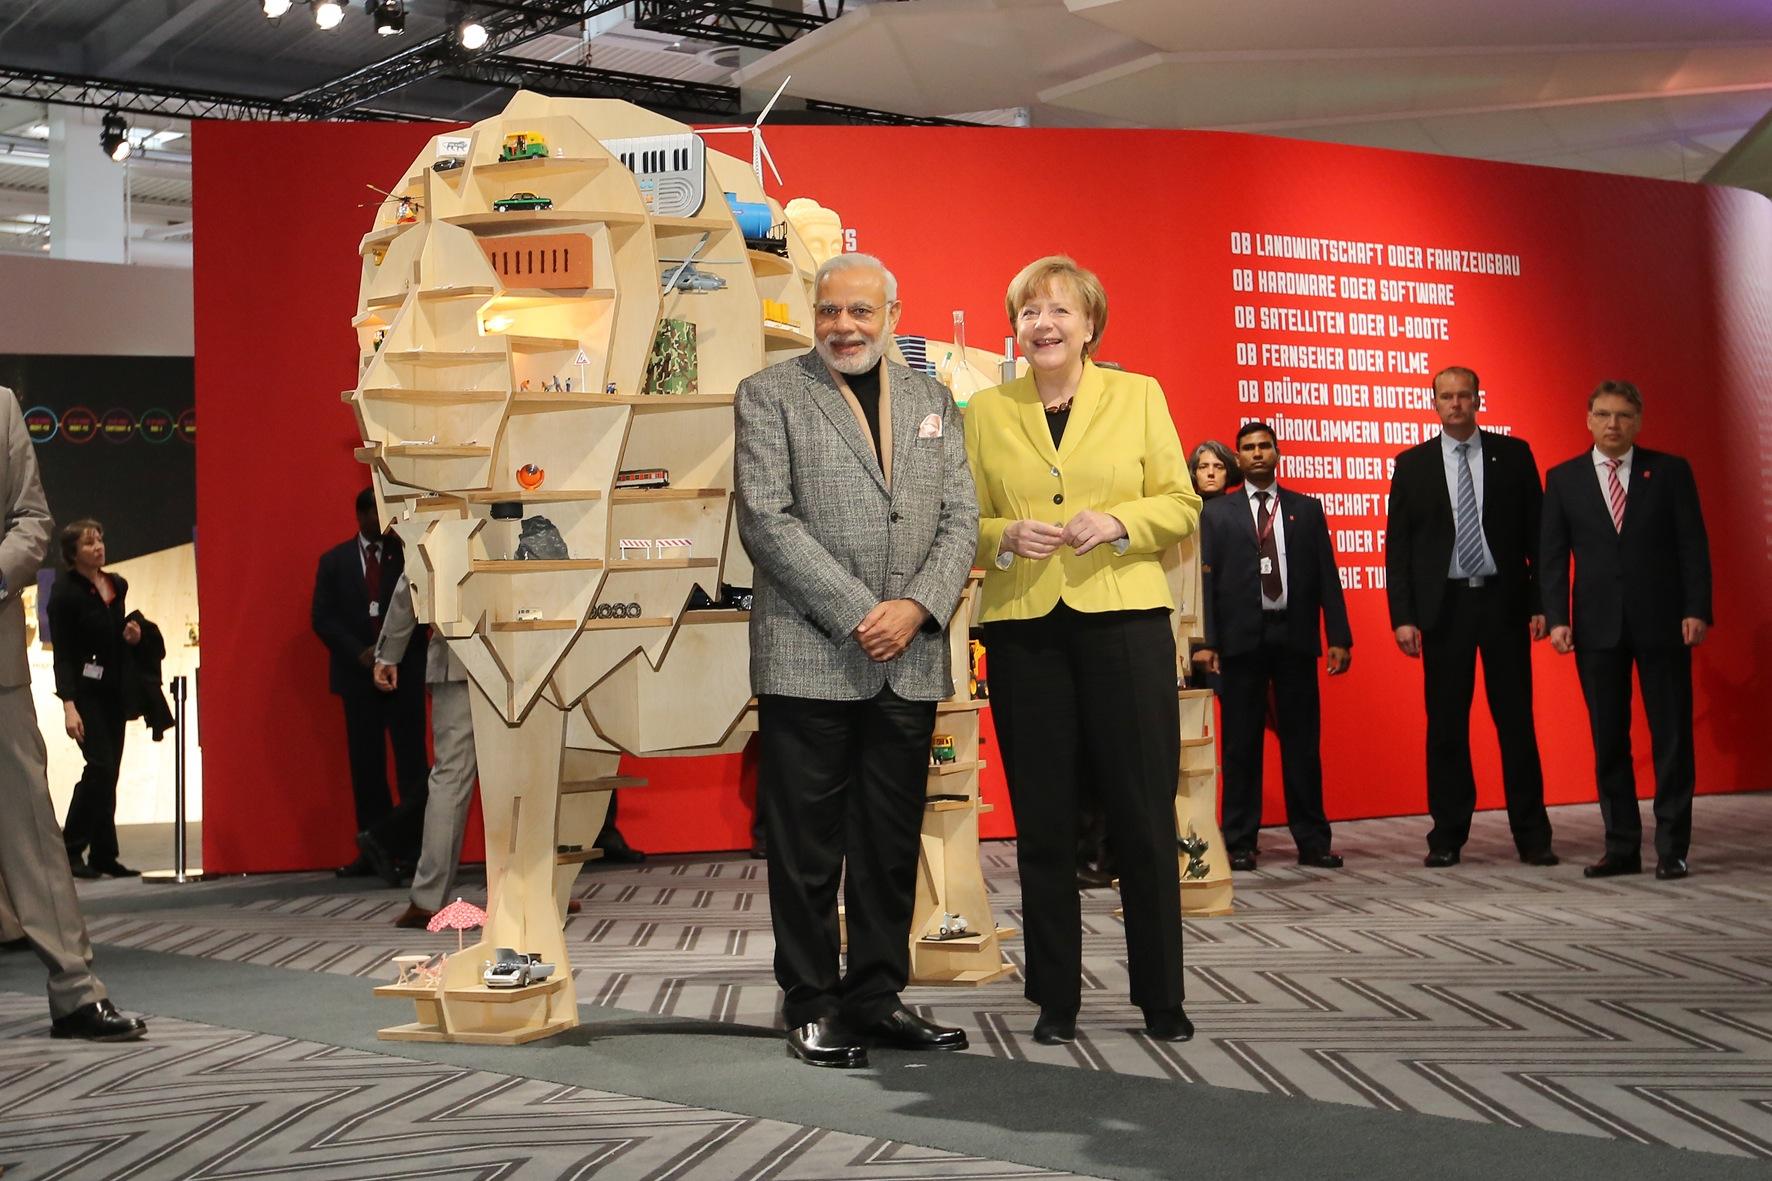 wieden kennedy delhi u2019s make in india campaign signifies